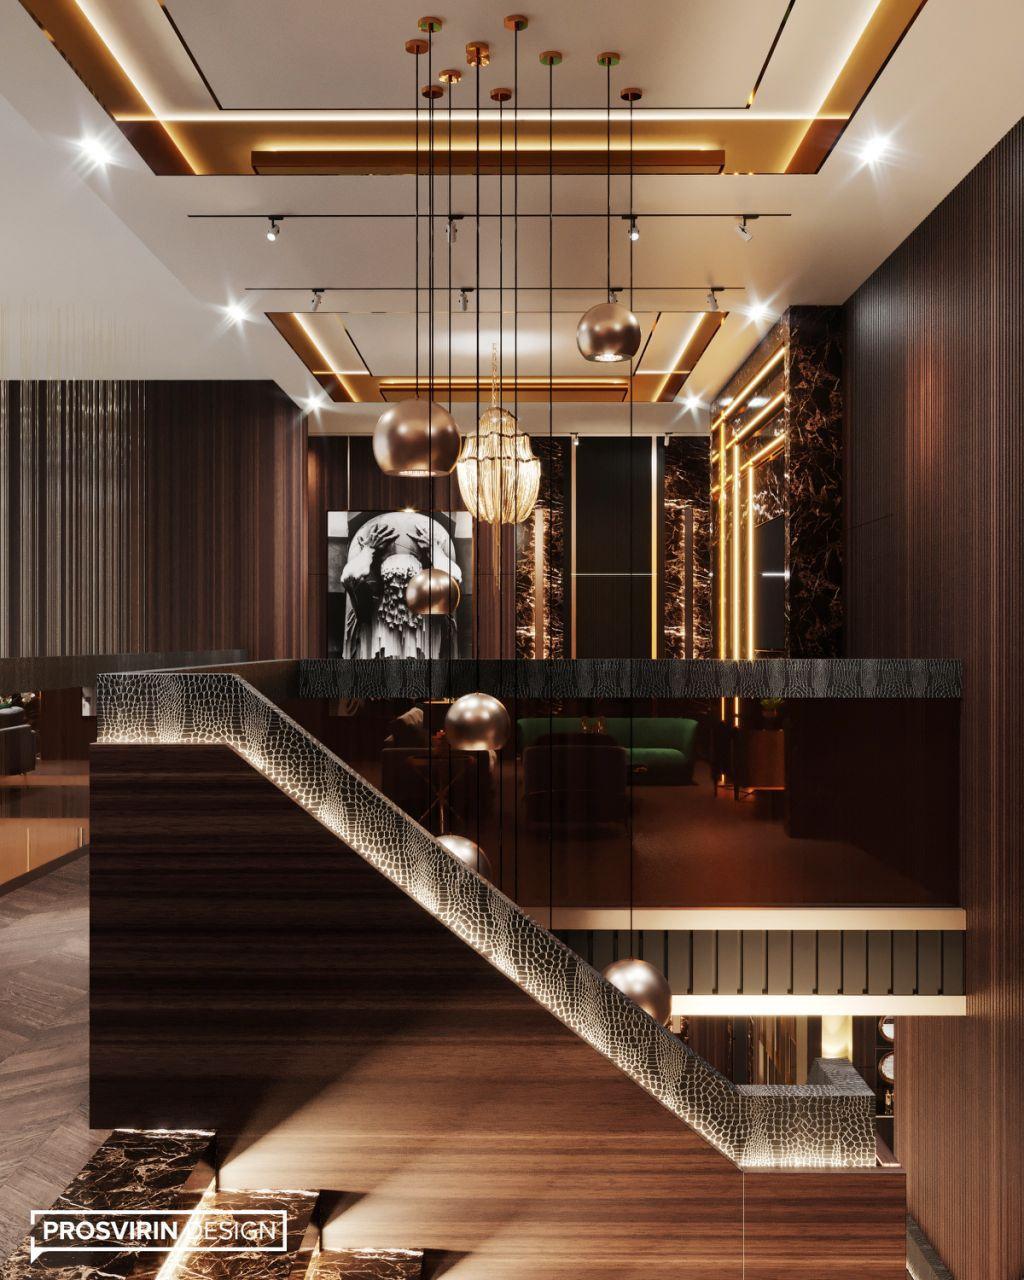 Living Hall Interior Design: Hall Design, Design, Interior Design